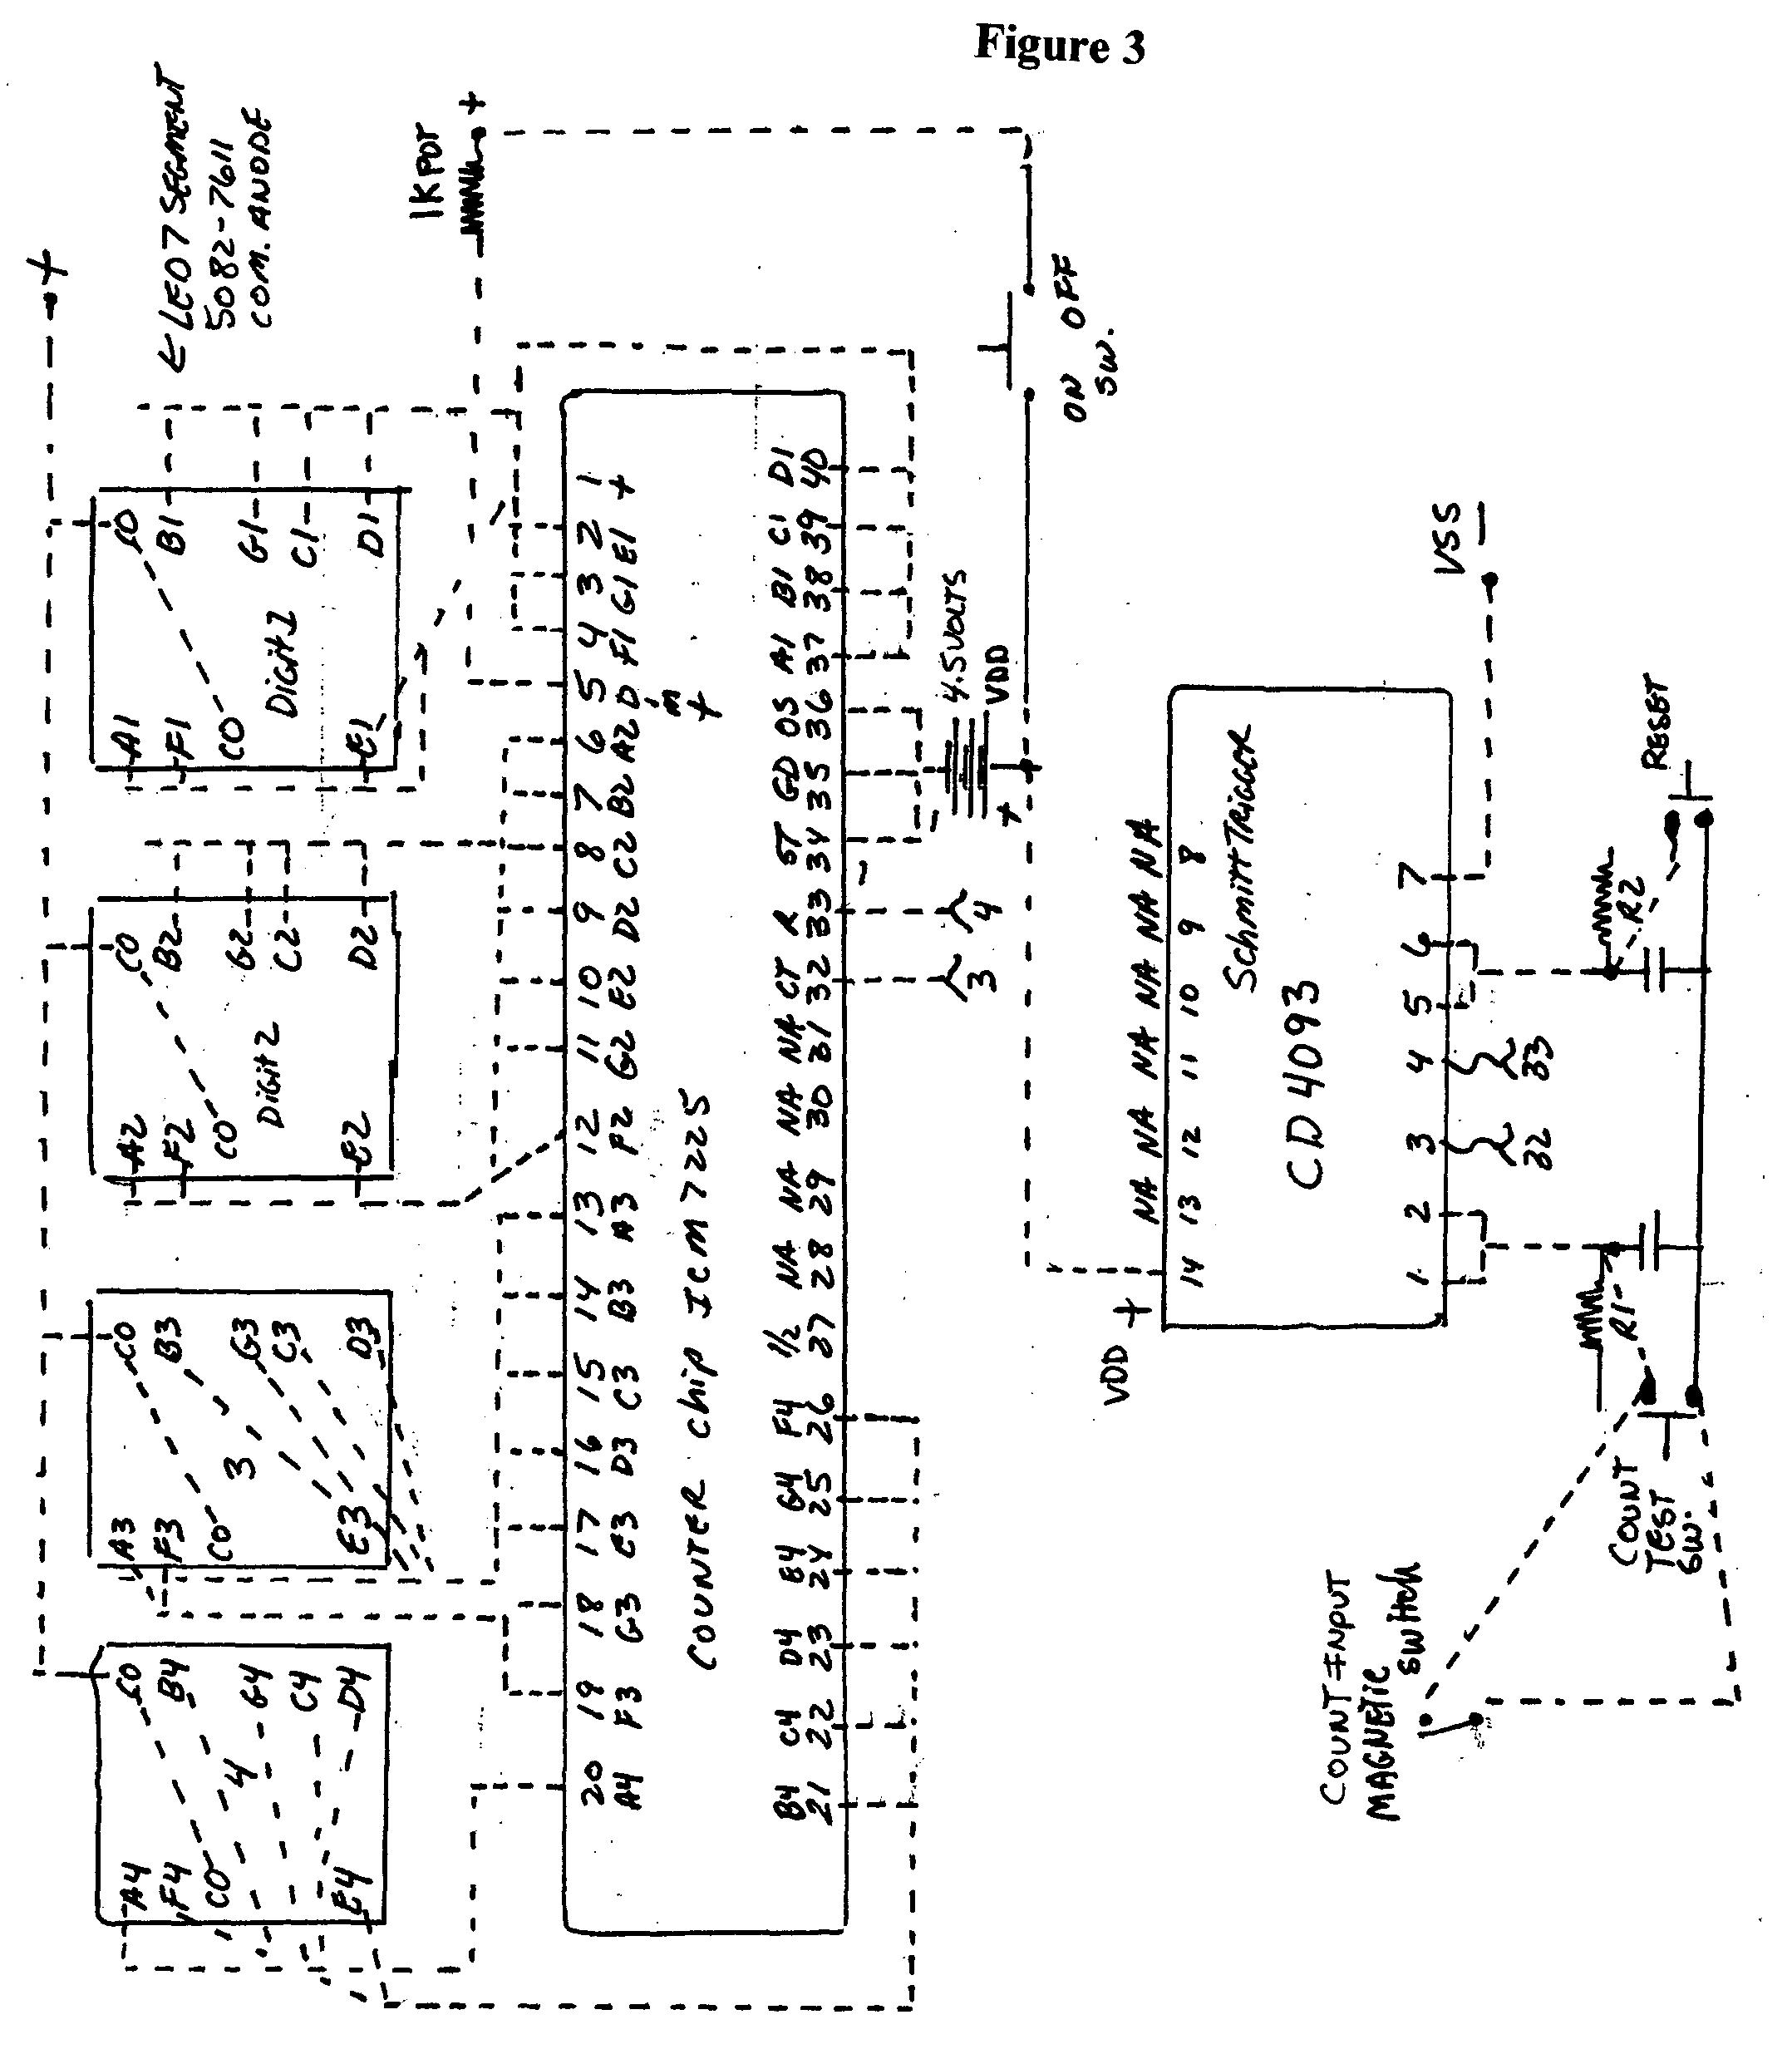 Electrical Conduit: Jetline Electrical Conduit